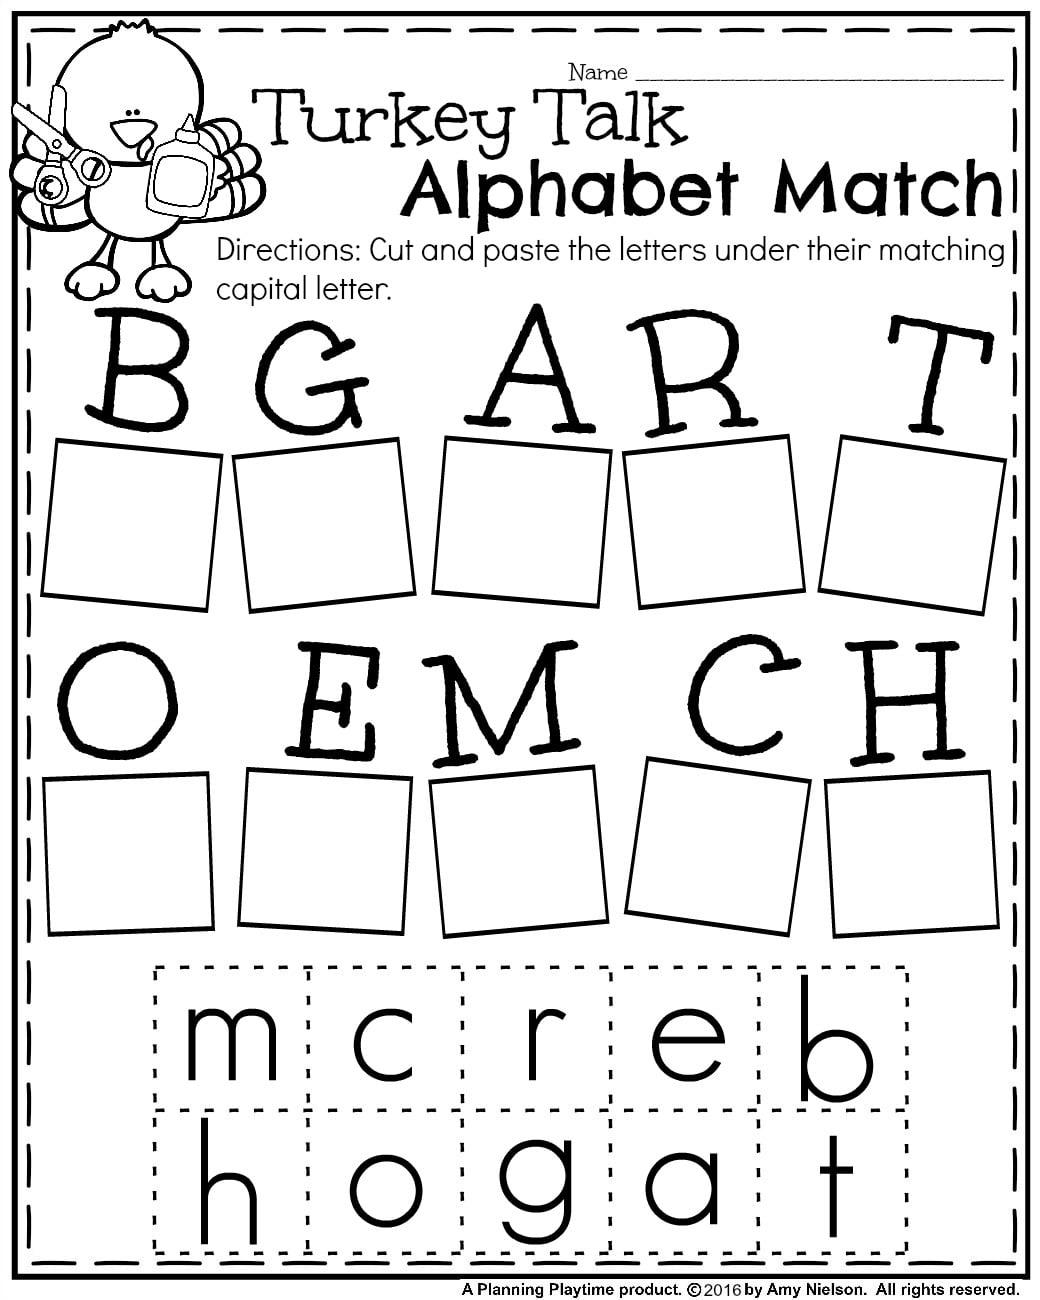 fall kindergarten worksheets for november  planning playtime free fall kindergarten worksheet for november  turkey alphabet match